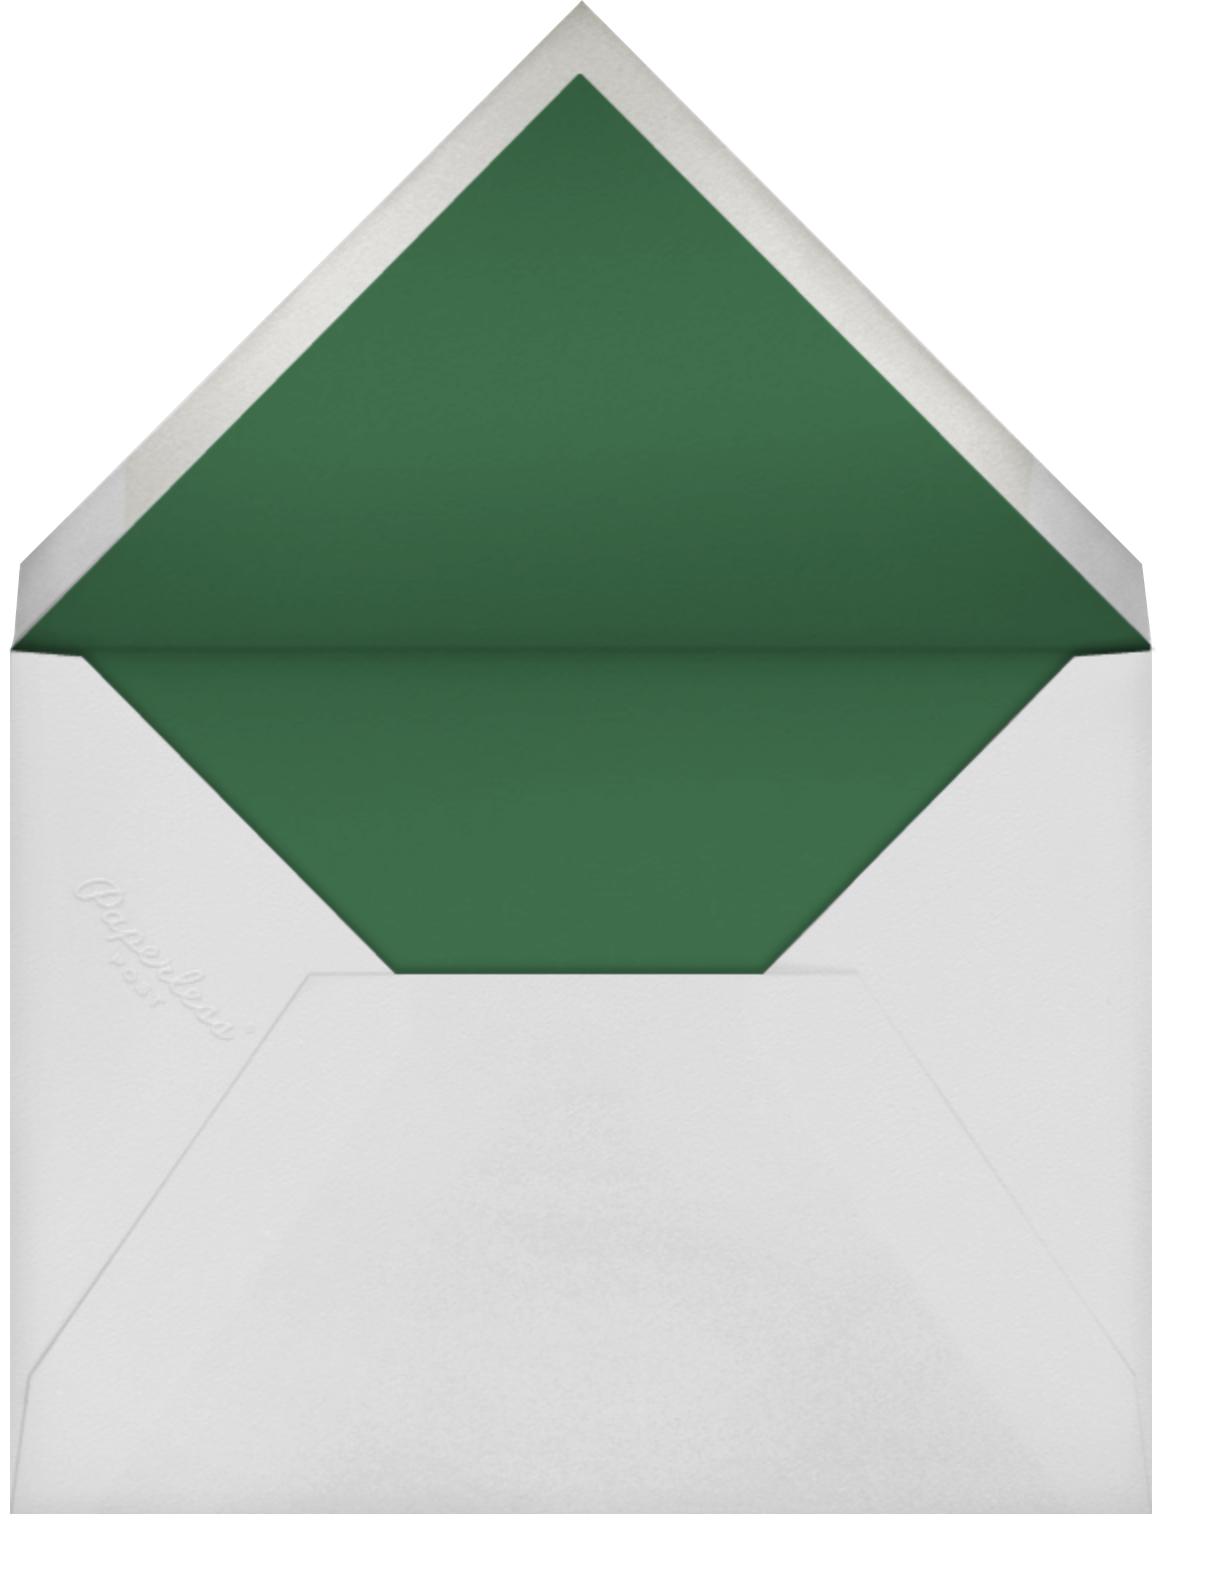 Bourgeois Bow (Christmas) - Gold - kate spade new york - Envelope